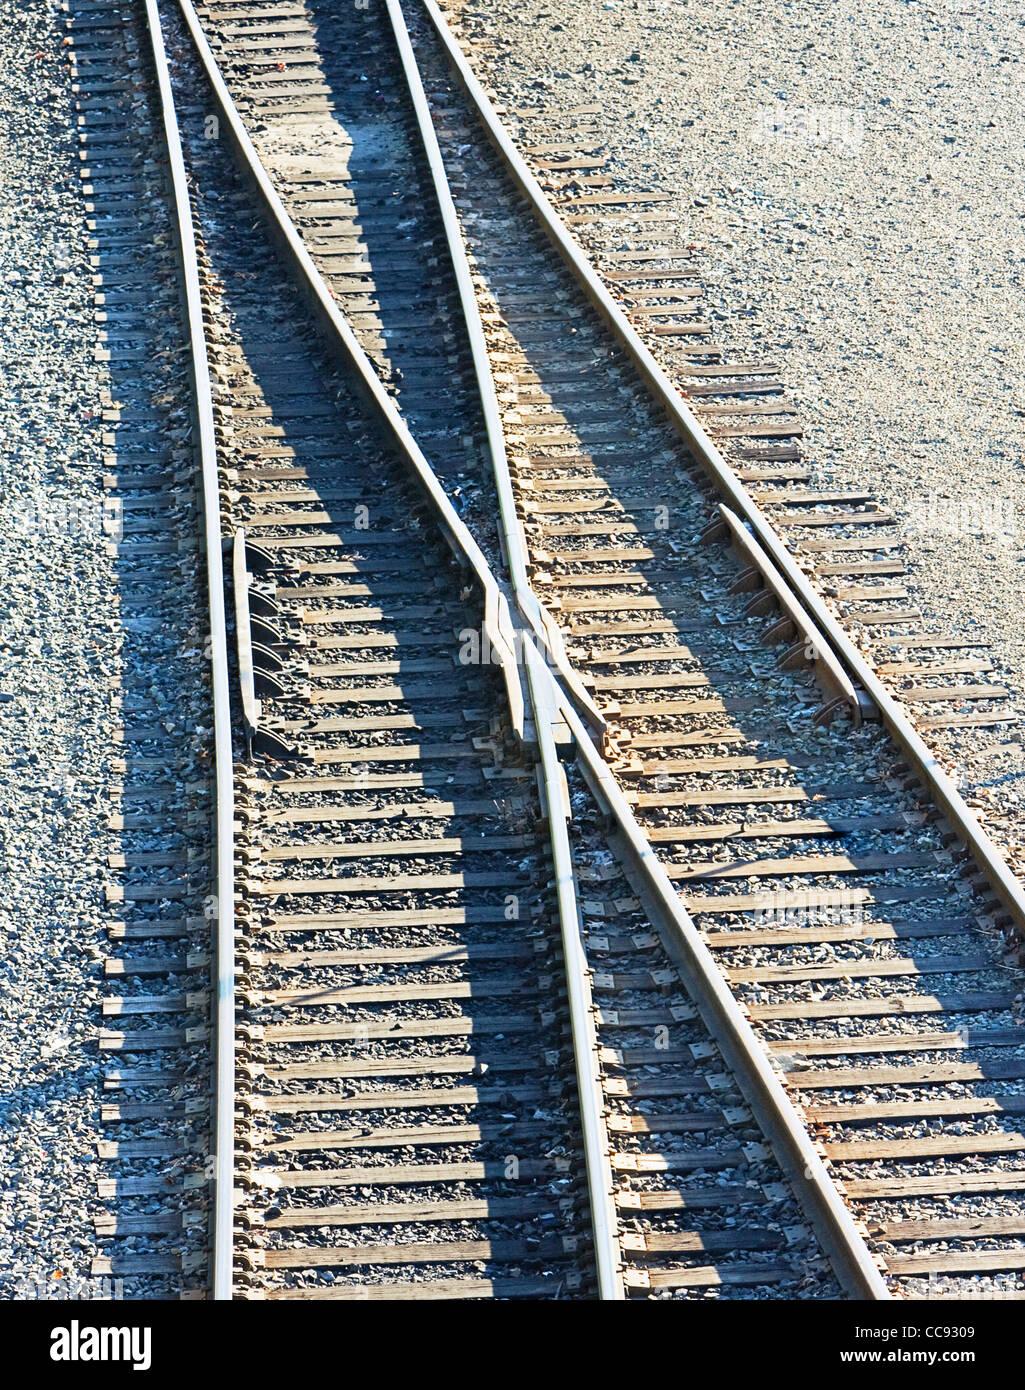 old railroad tracks - Stock Image